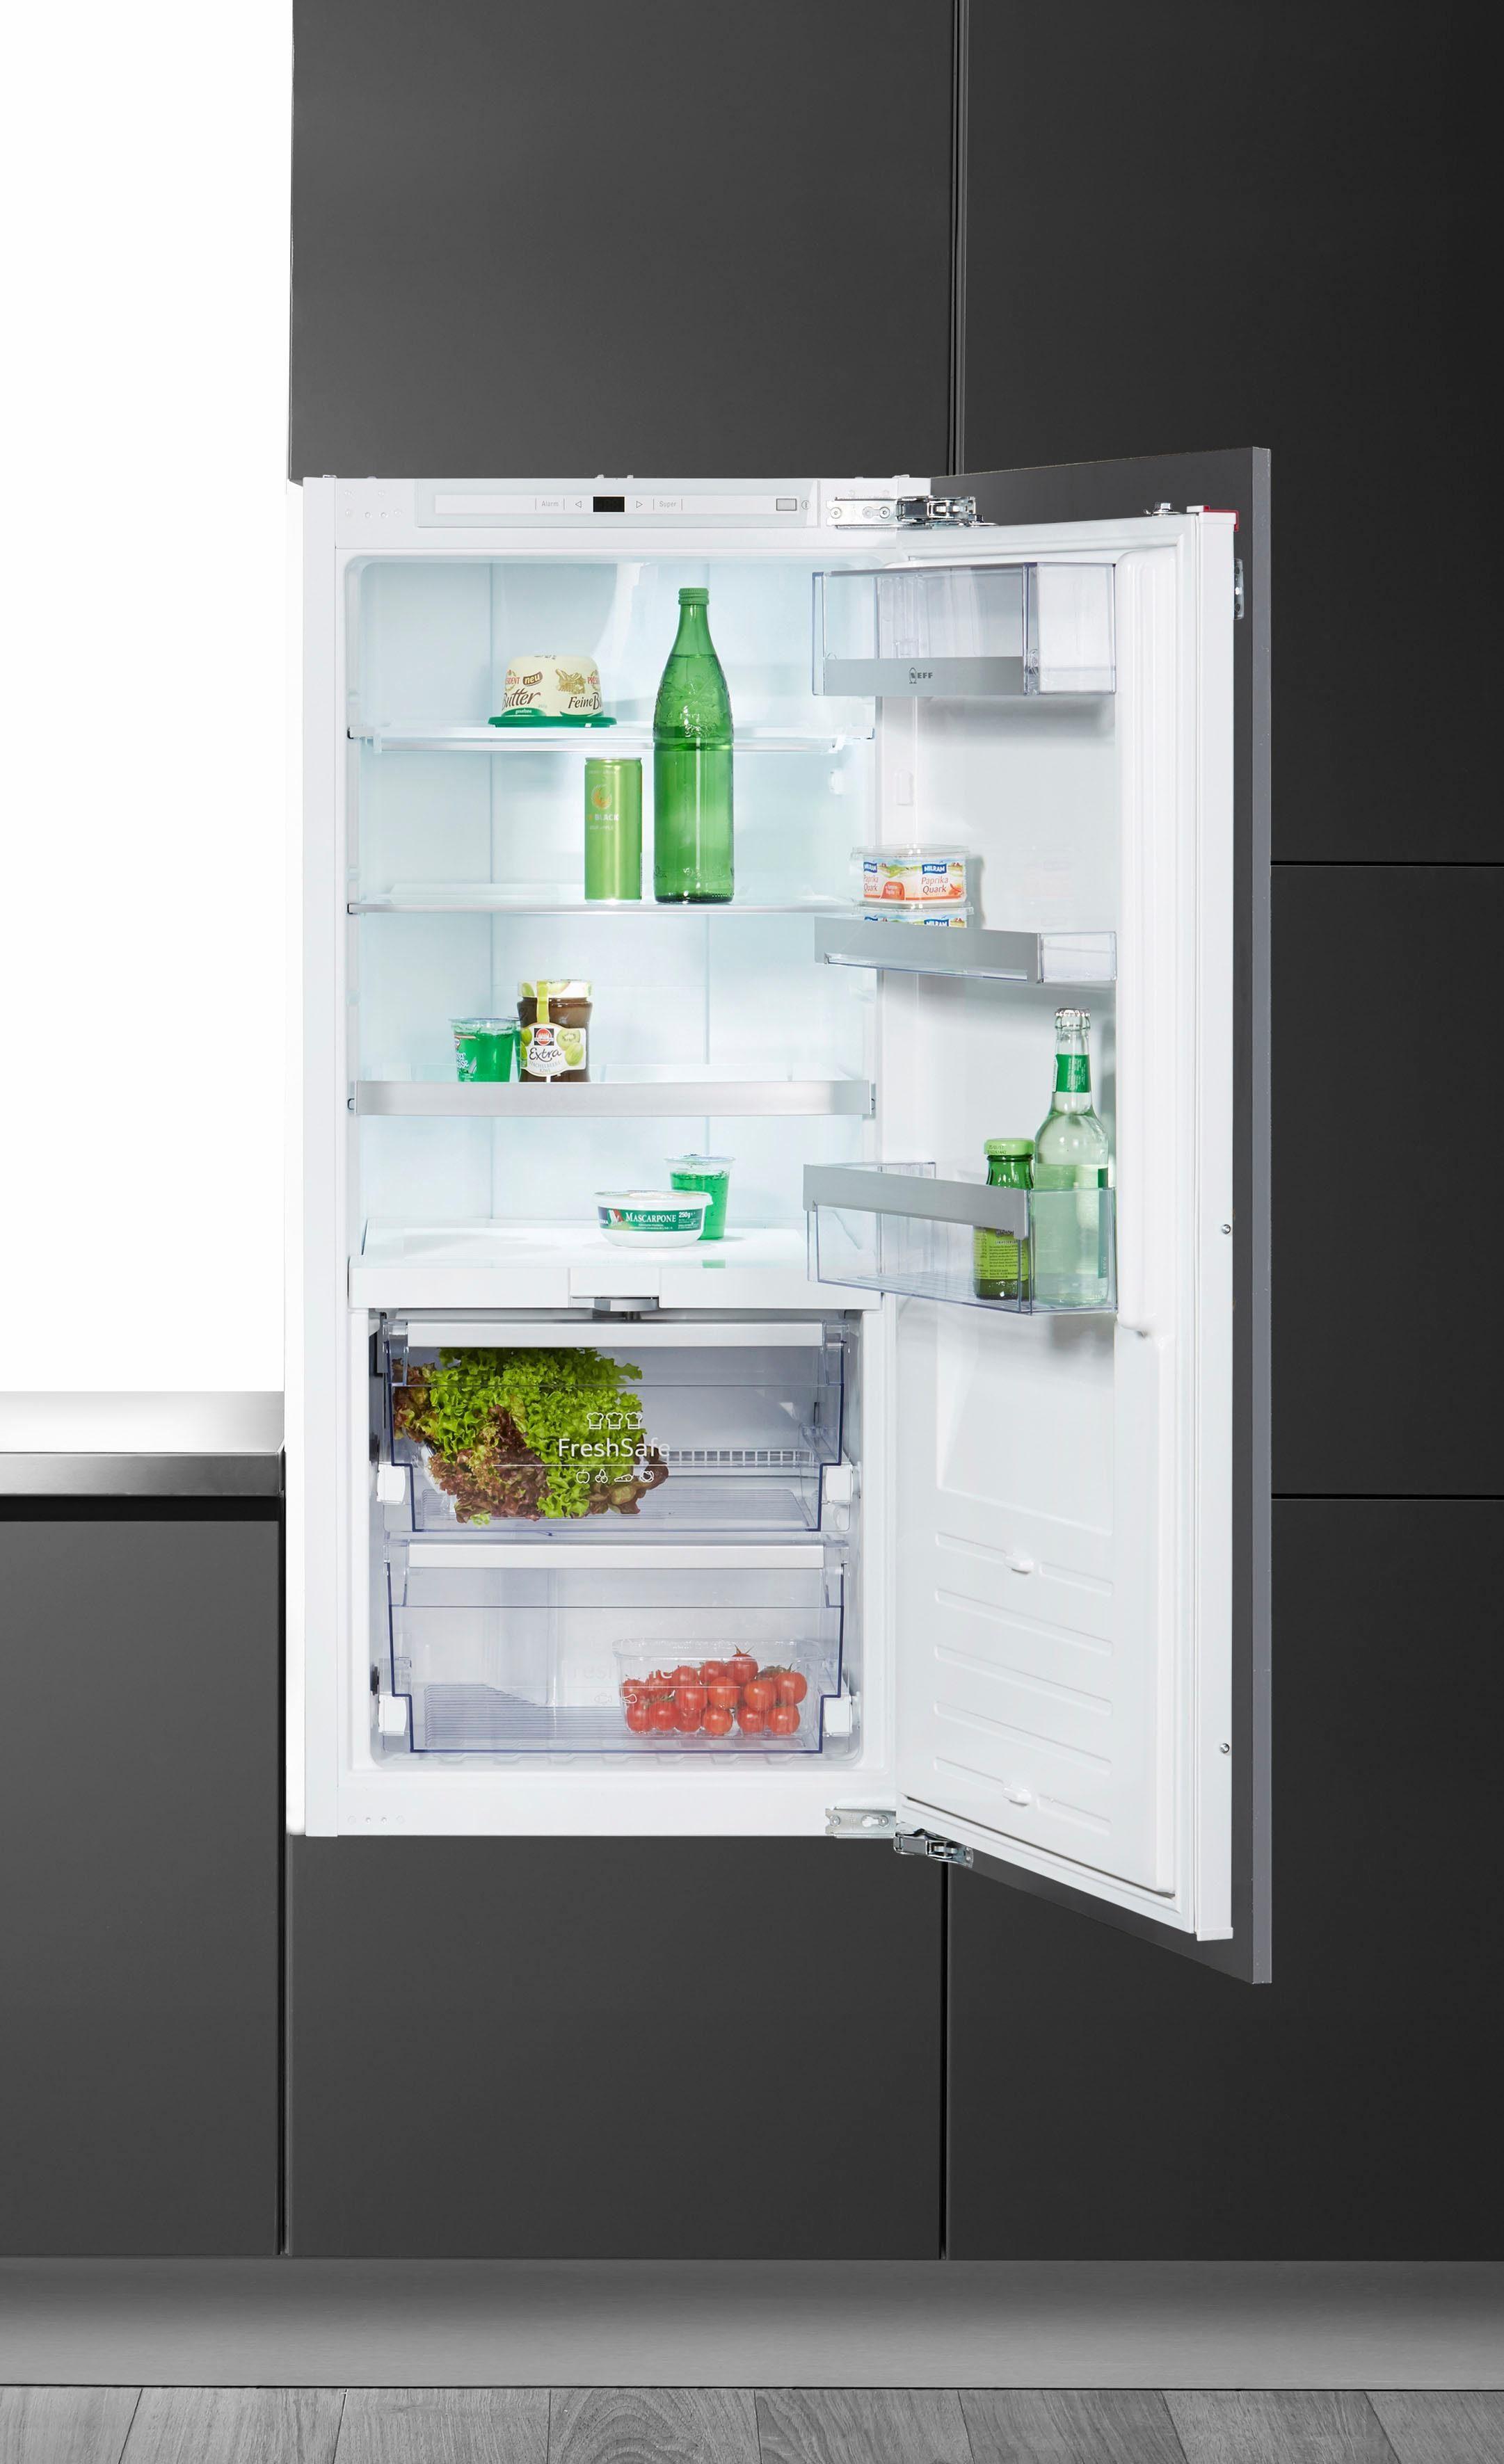 NEFF Einbaukühlschrank KN436A2 / KI8413D30, 122,1 cm hoch, 55,8 cm breit, Energieklasse A++, 122 cm hoch, integrierbar